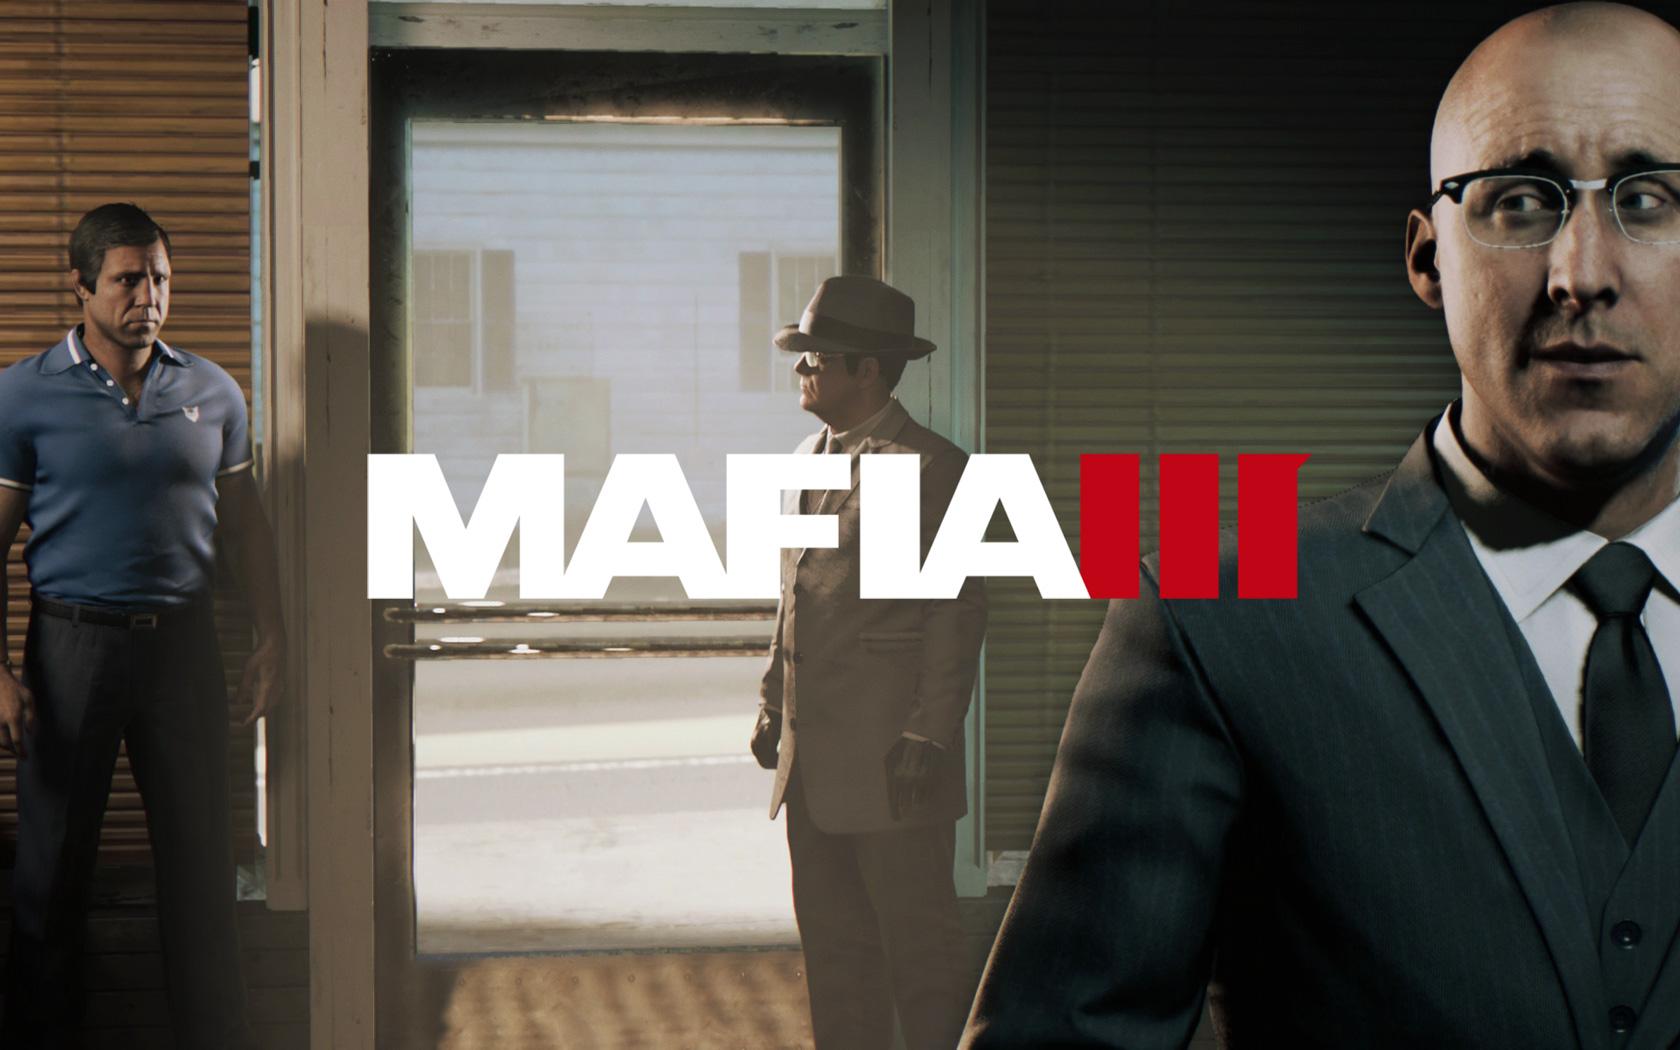 Free Mafia III Wallpaper in 1680x1050